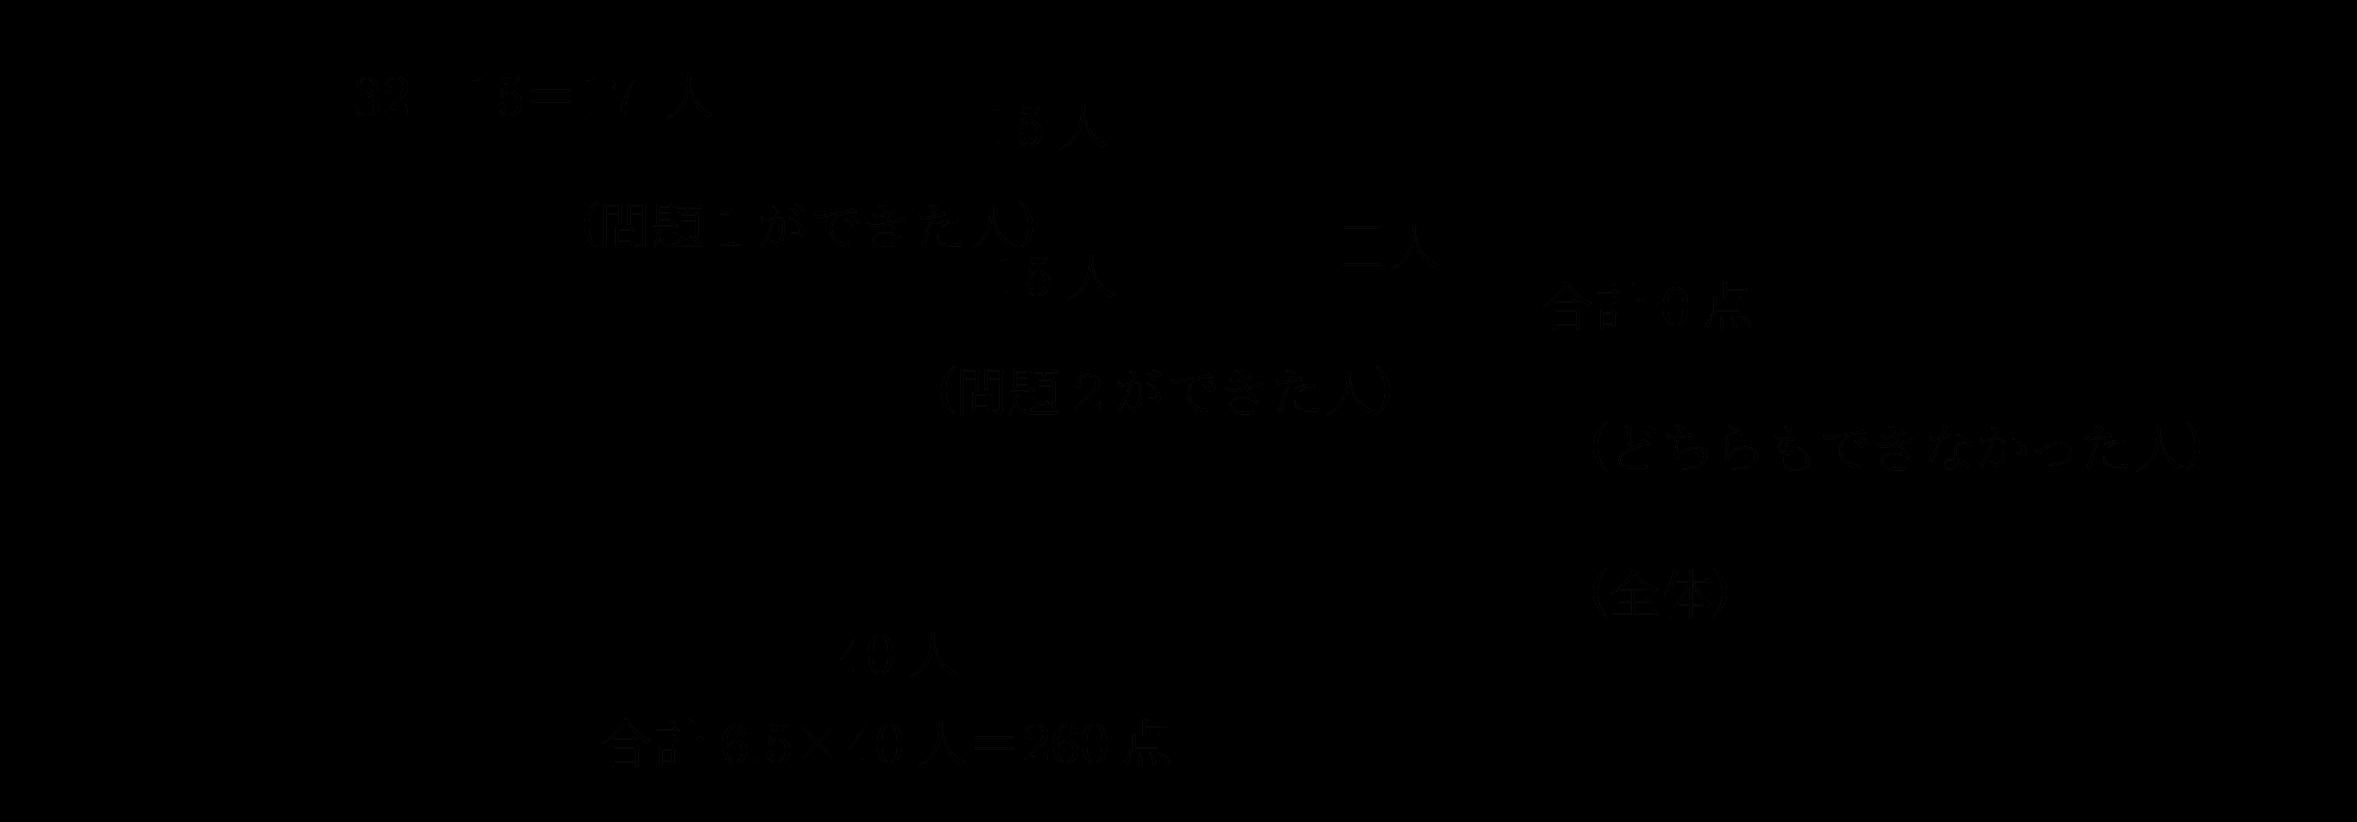 2018_gouhi_sansu1